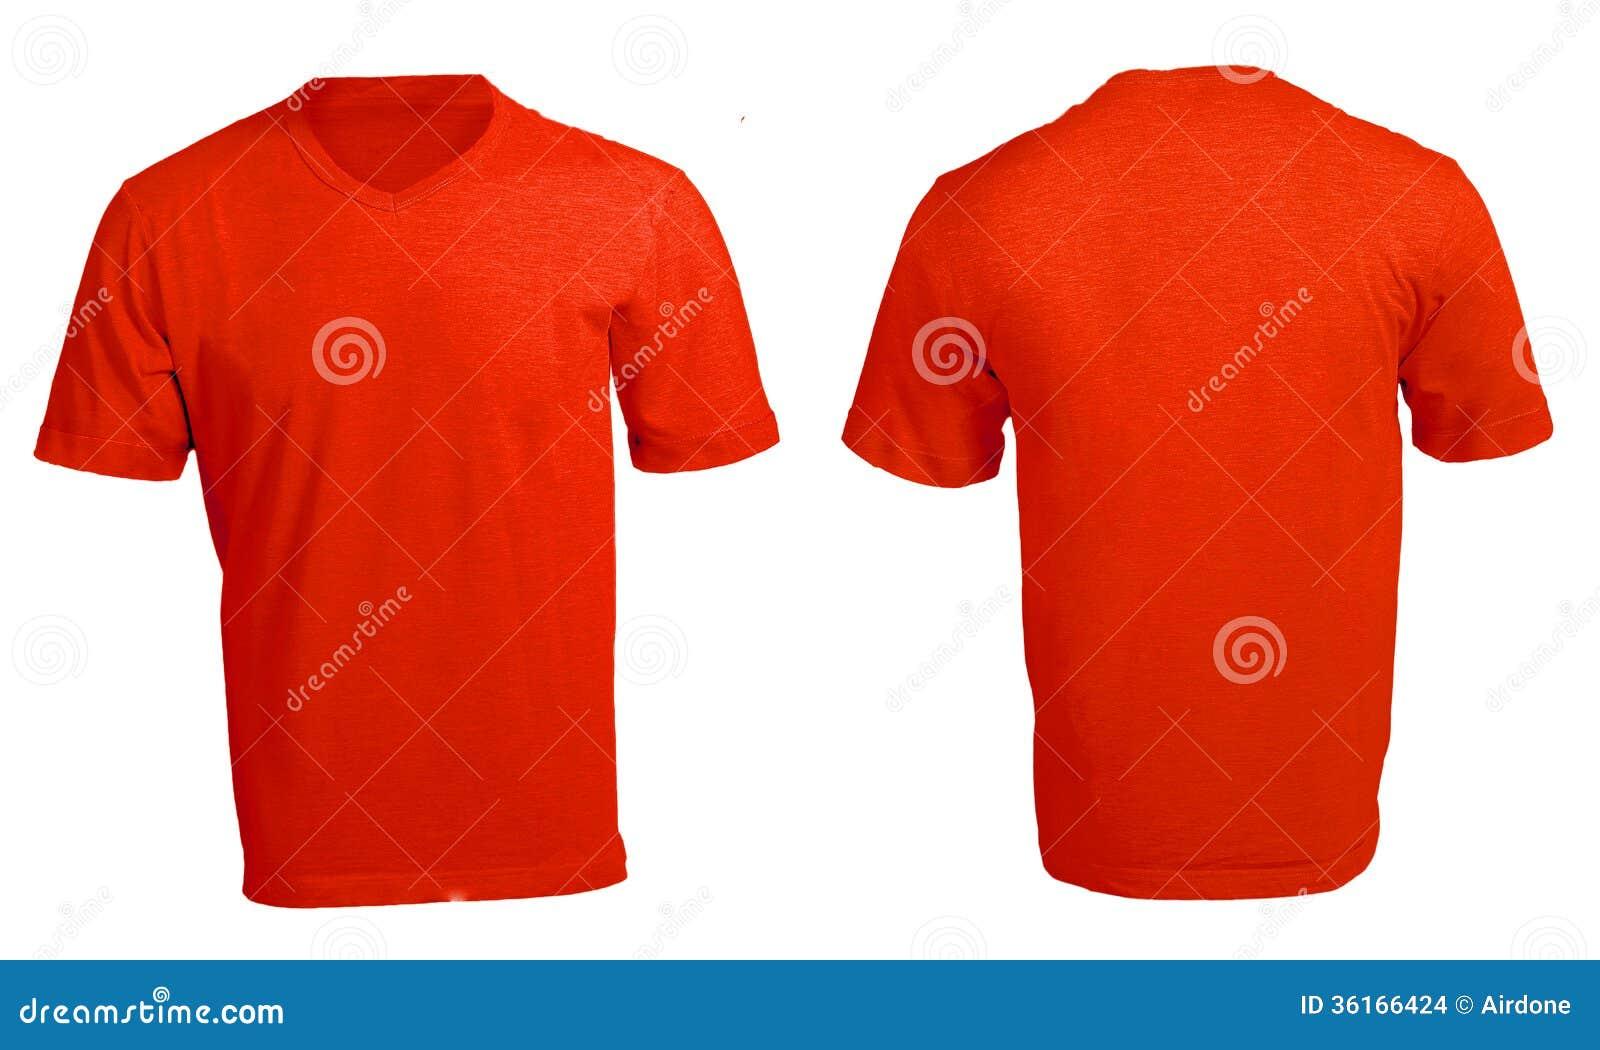 Design shirt v neck - Men S Blank Red V Neck Shirt Template Stock Images